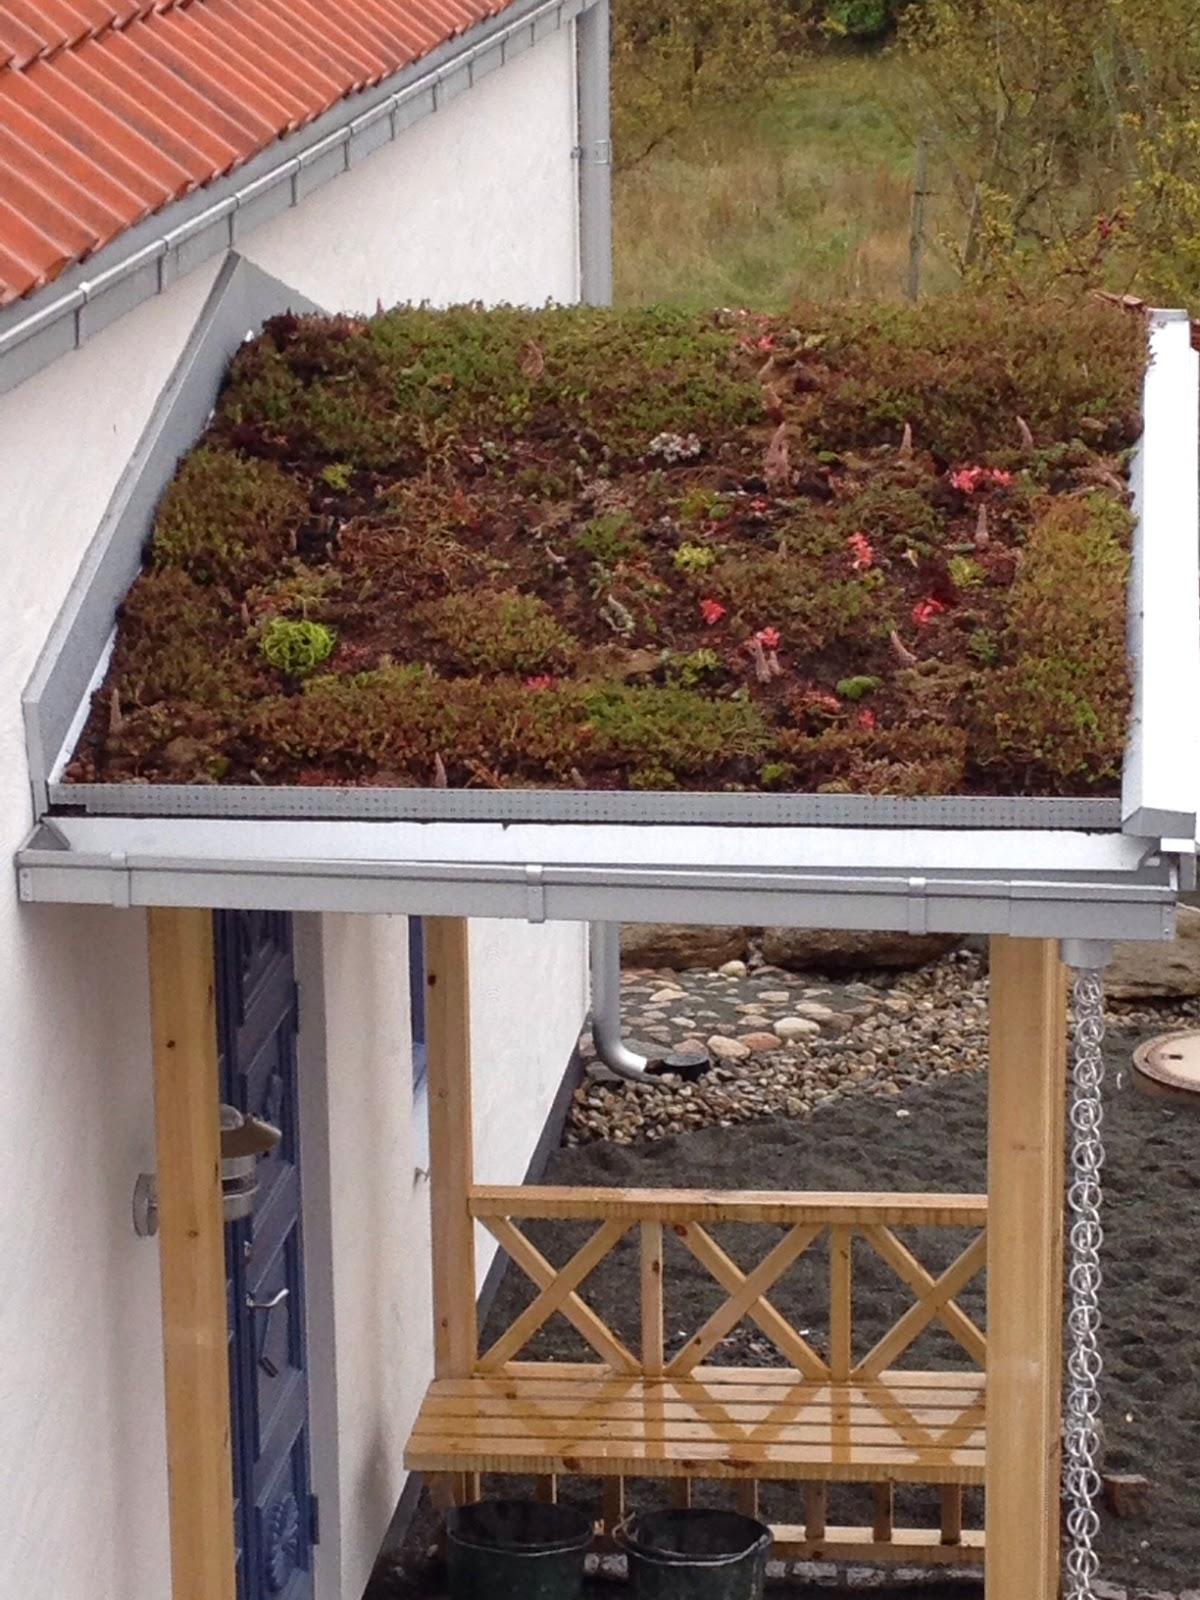 Villa Natura ekologiskt lågenergihus farstukvist sedum tak